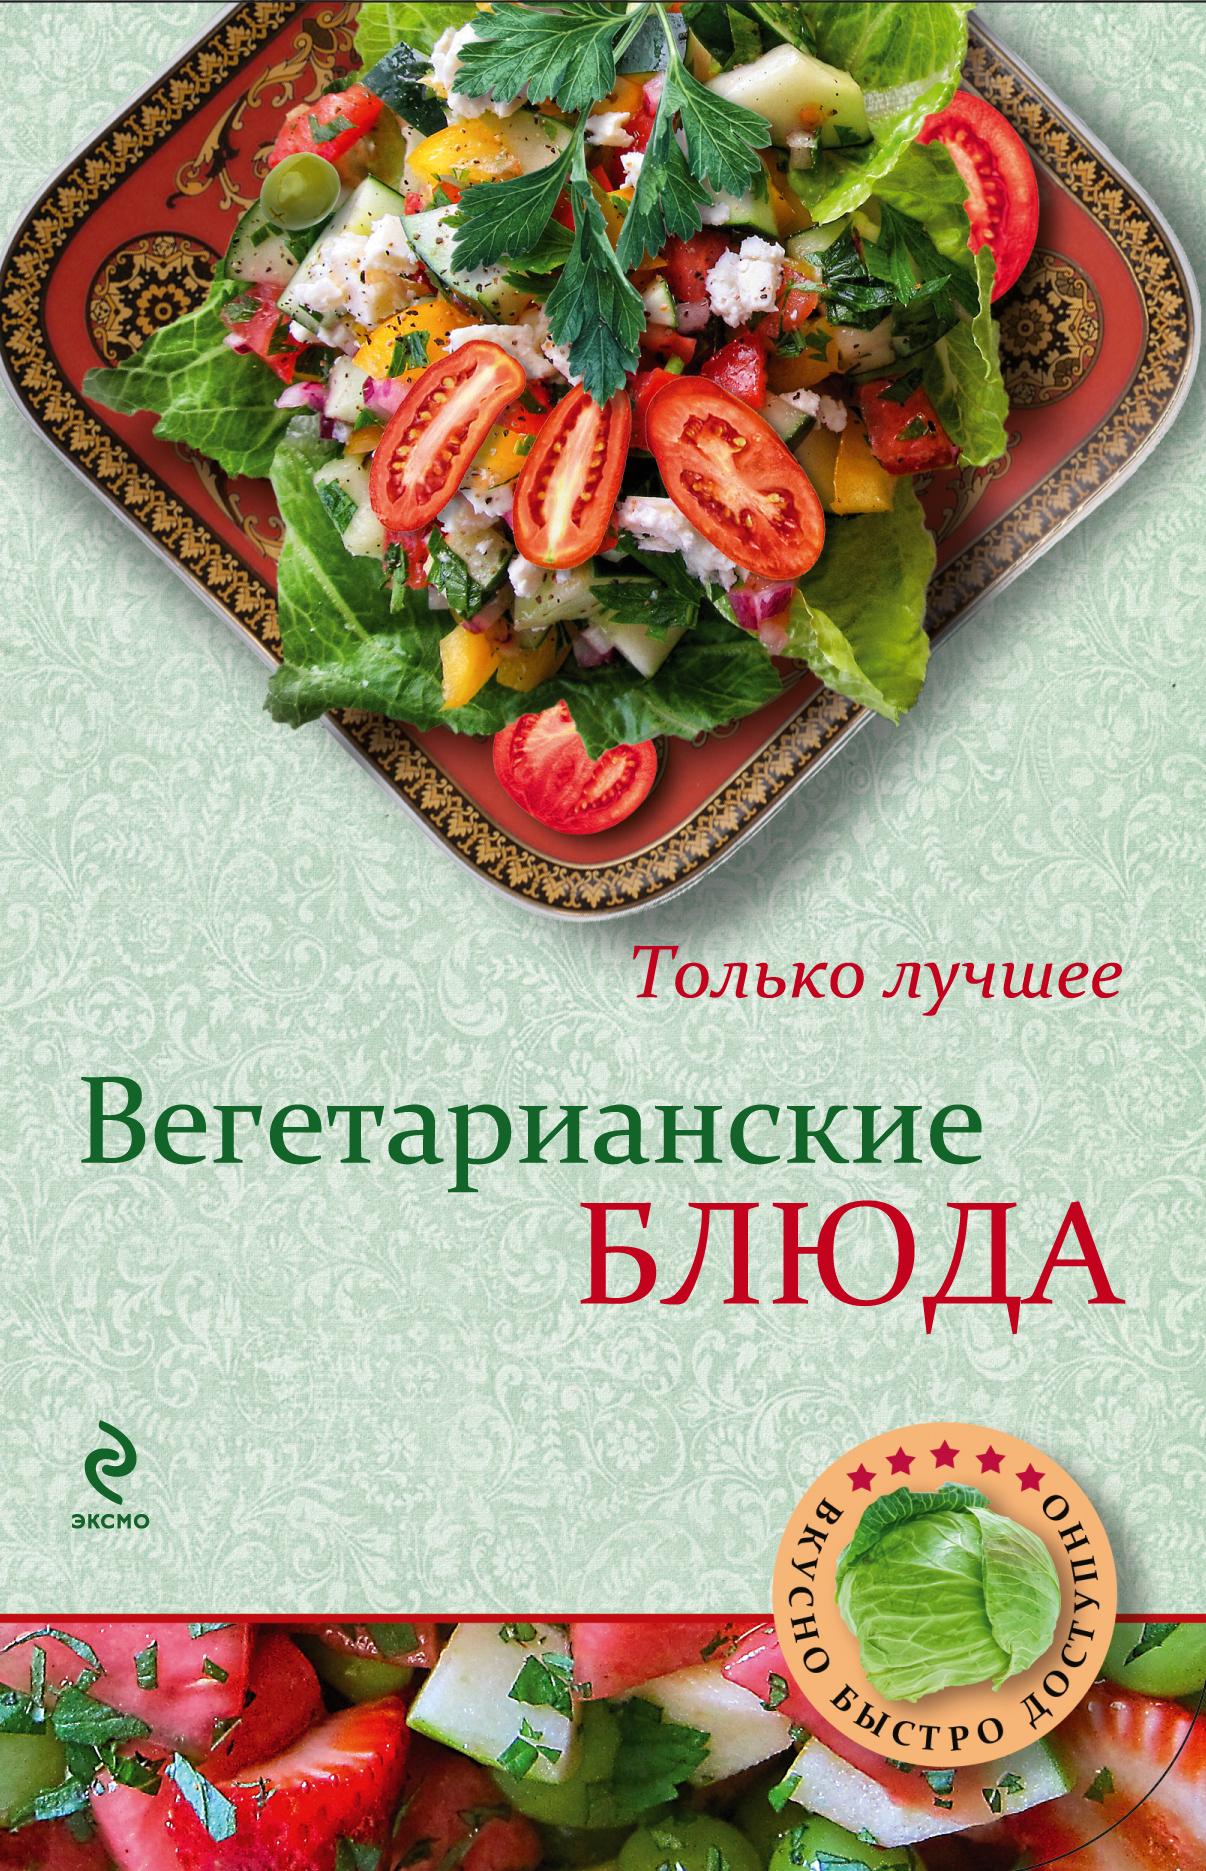 Савинова Н.А. Вегетарианские блюда